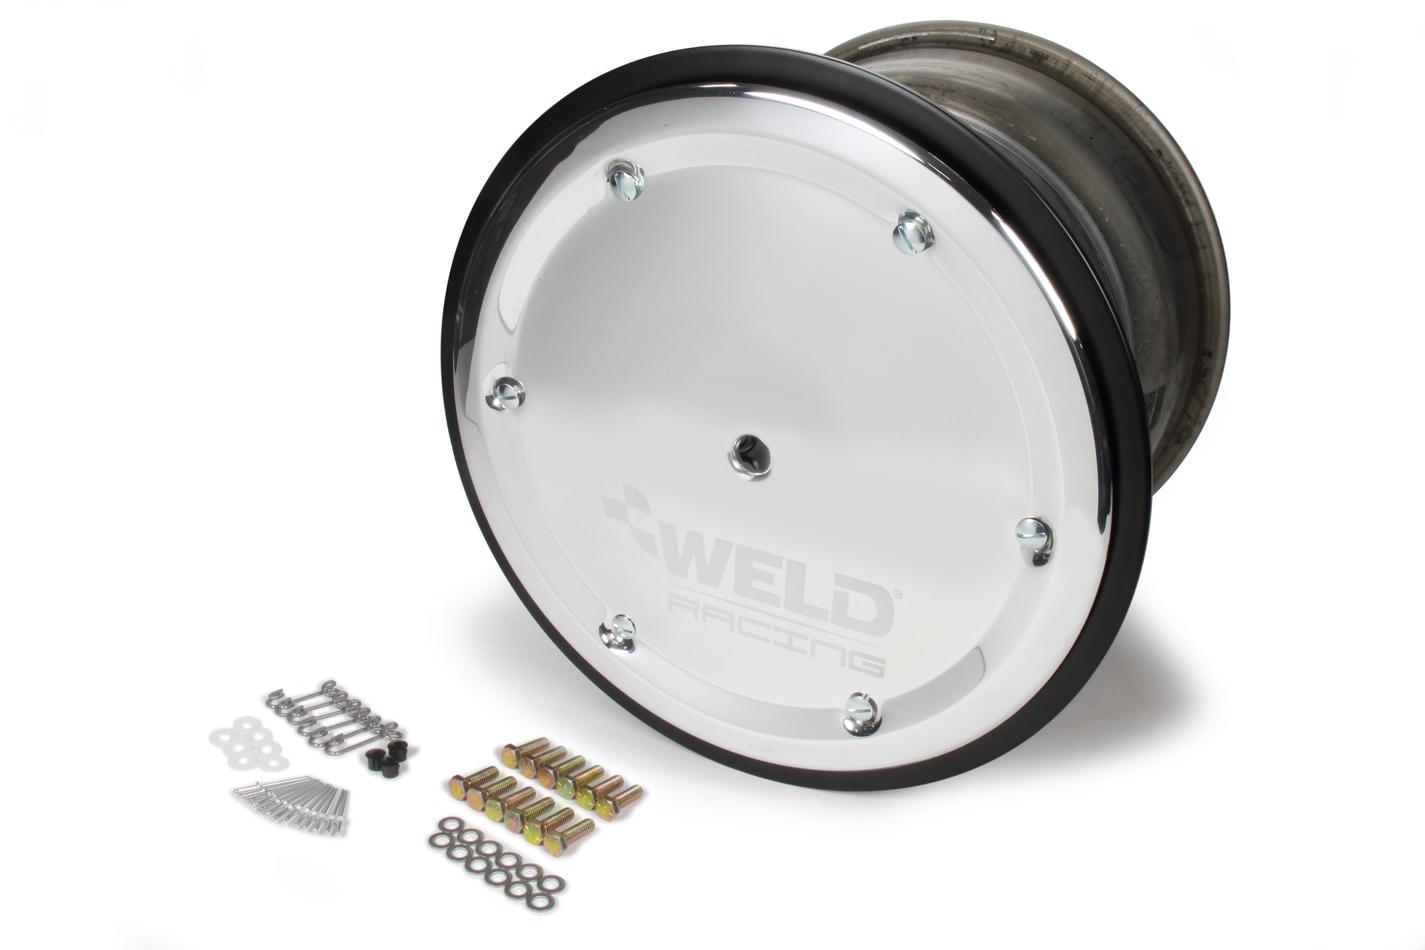 WELD RACING 15 X 12 Wide 5 XL 5in BS Bead-Loc w/Cvr P/N -559-5255M-6